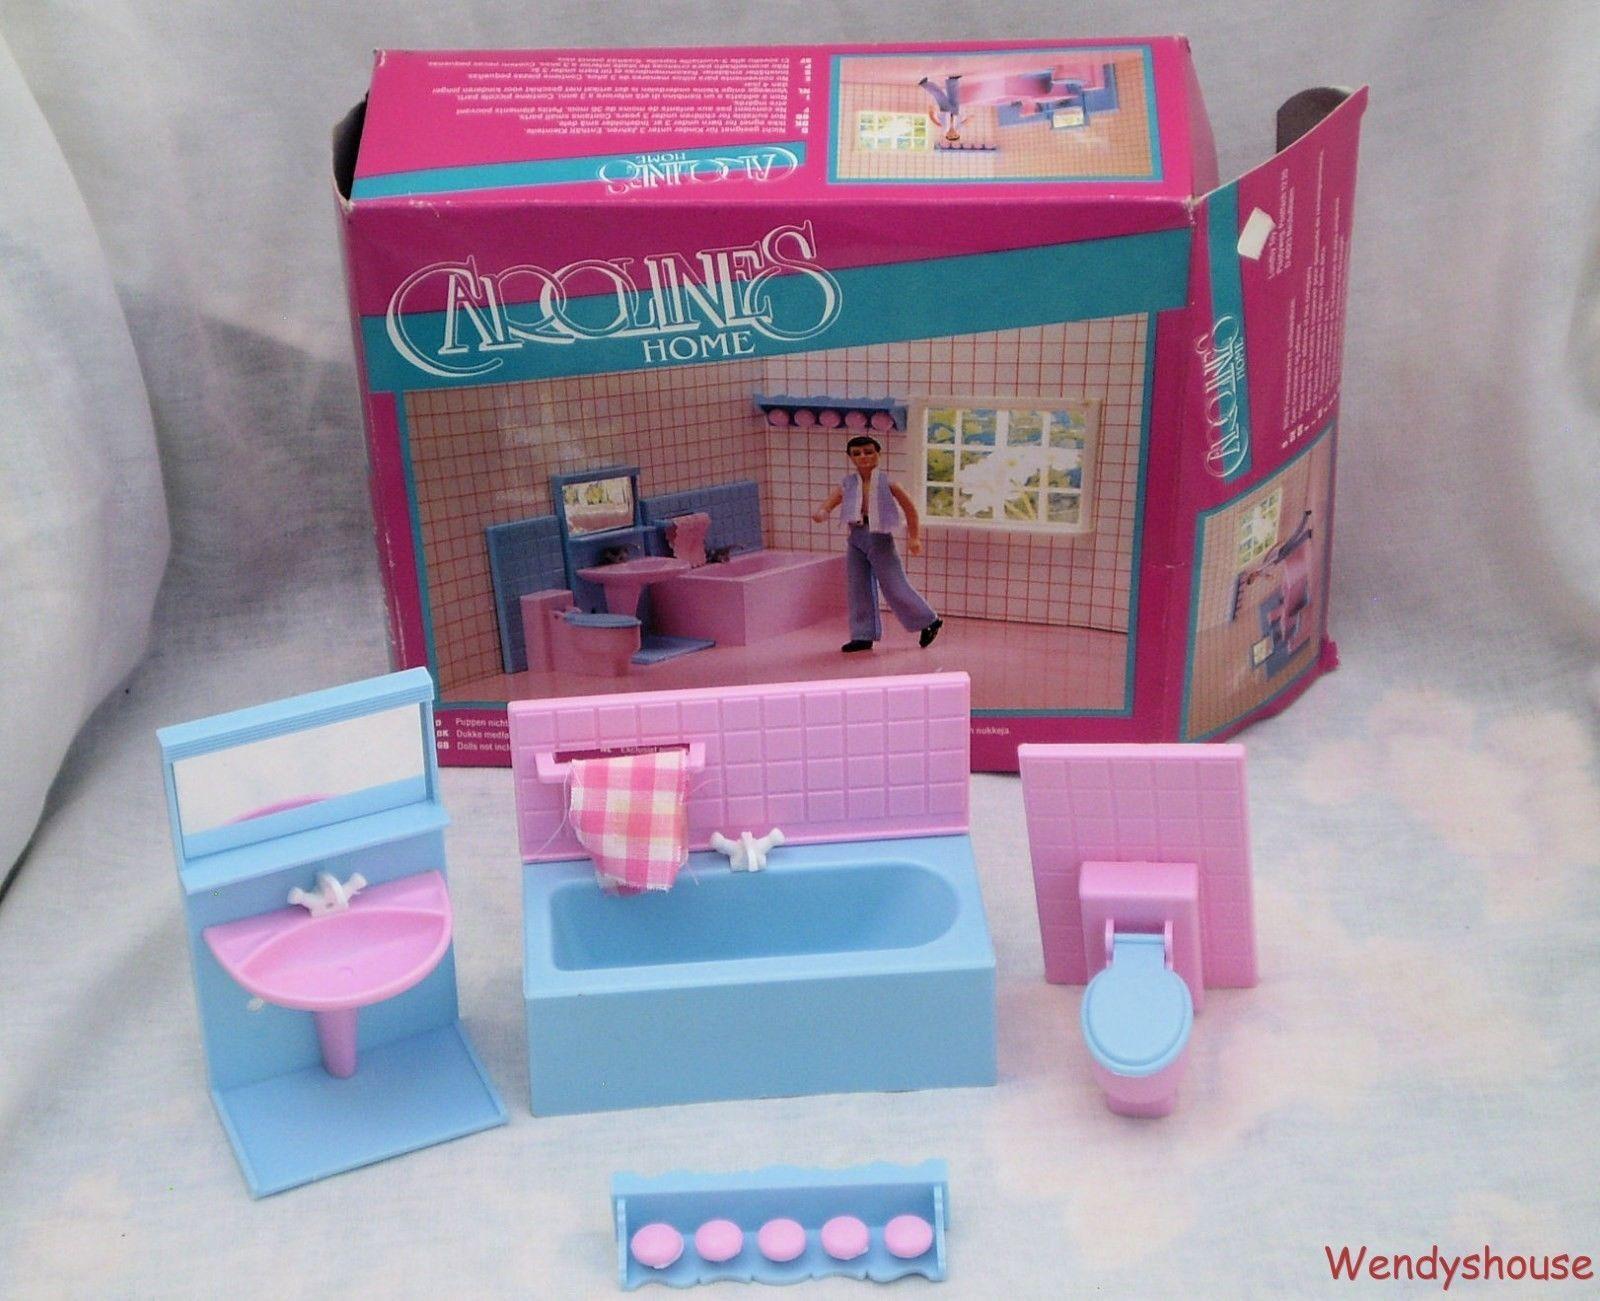 Boxed Carolines Home /lundby Dolls House Bathroom Furniture   Free Uk P U0026 P